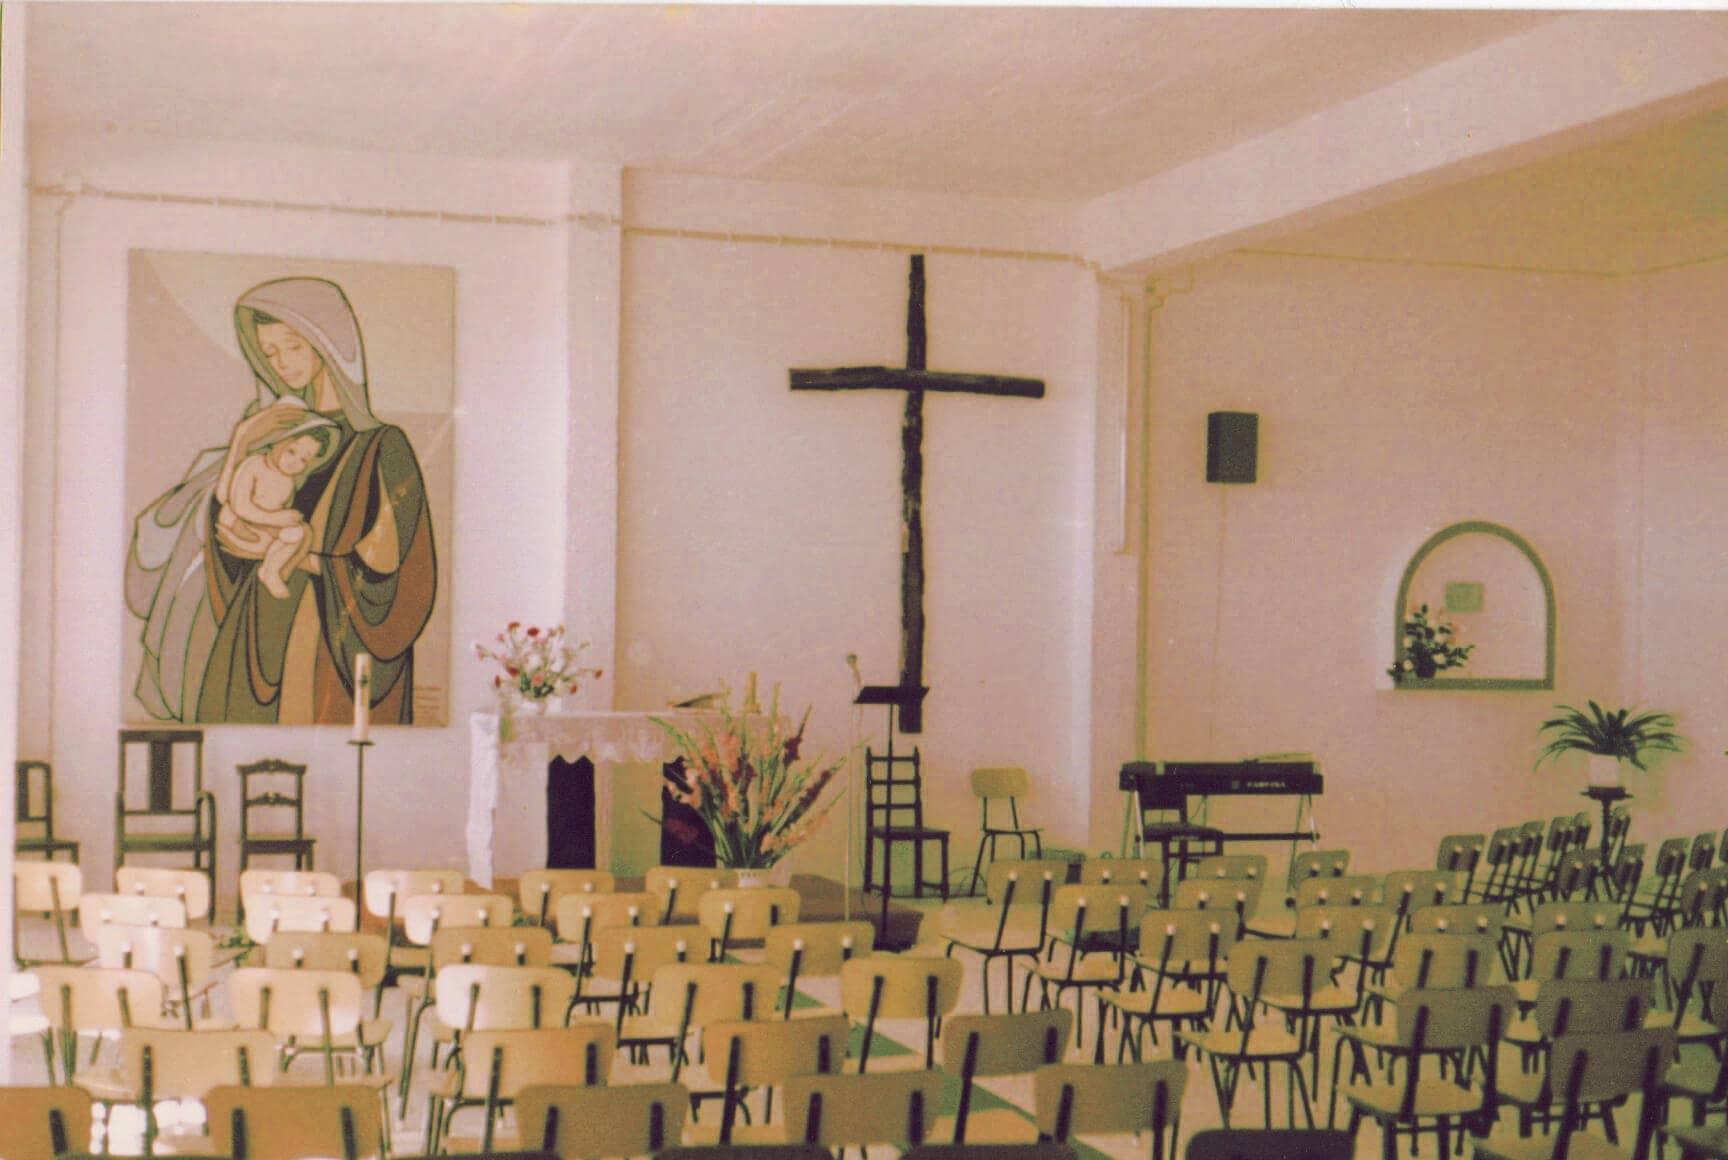 historia-cripta-funcionand-como-capela